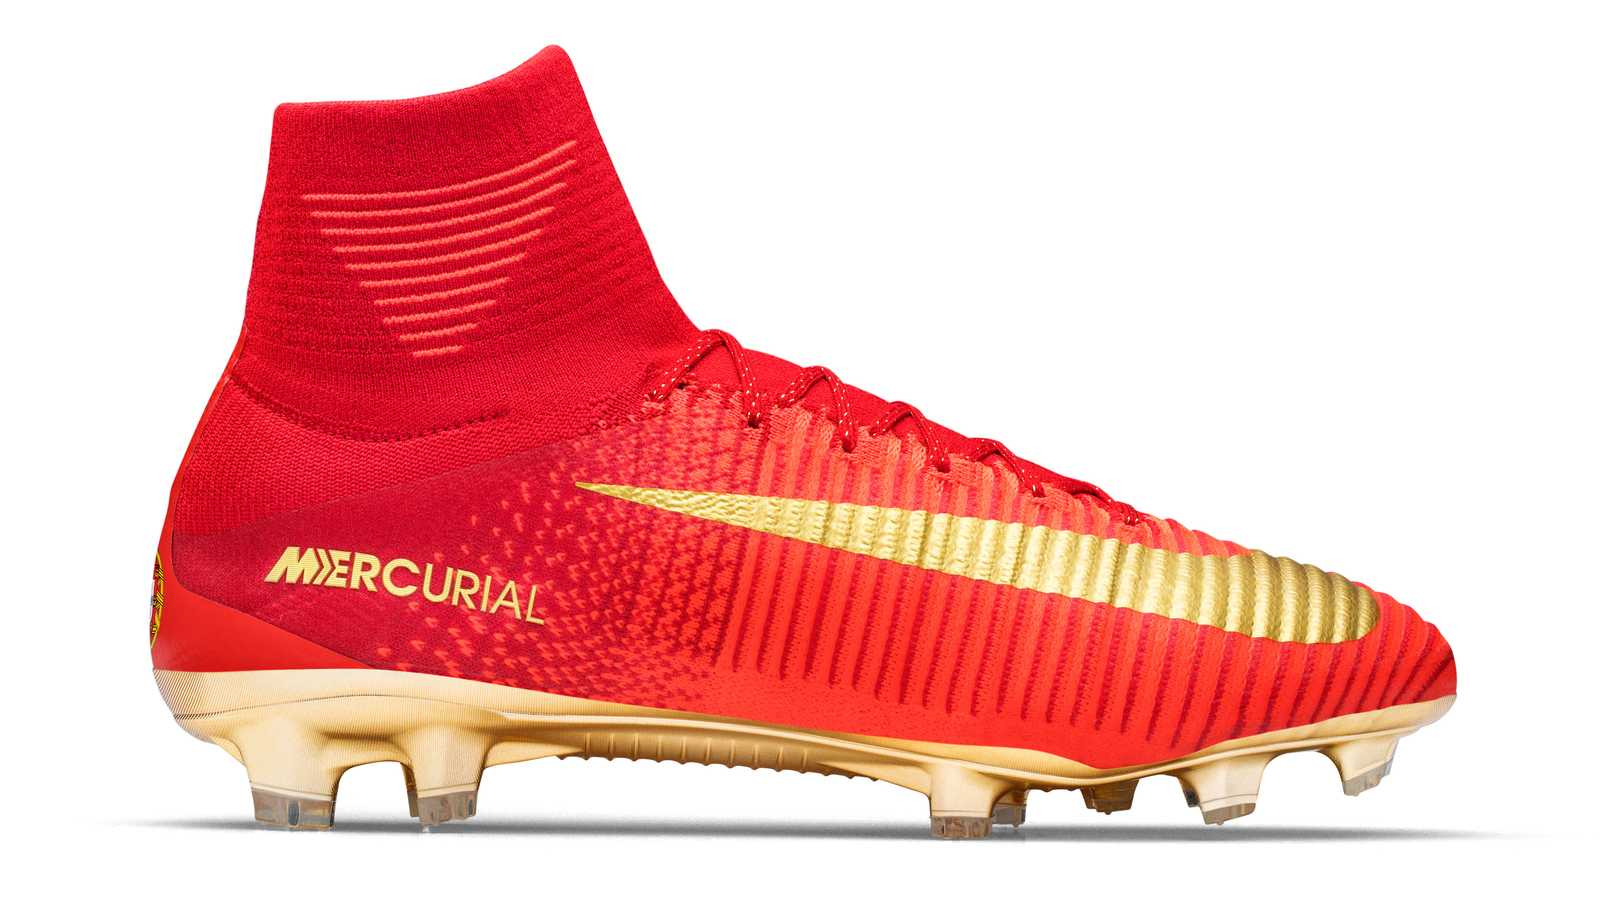 Discover Cristiano Ronaldo's Nike Limited Edition Boots Limited Edition Discover Cristiano Ronaldo's Nike Limited Edition Boots nike mercurial superfly v cristiano ronaldo campeoes boots 3